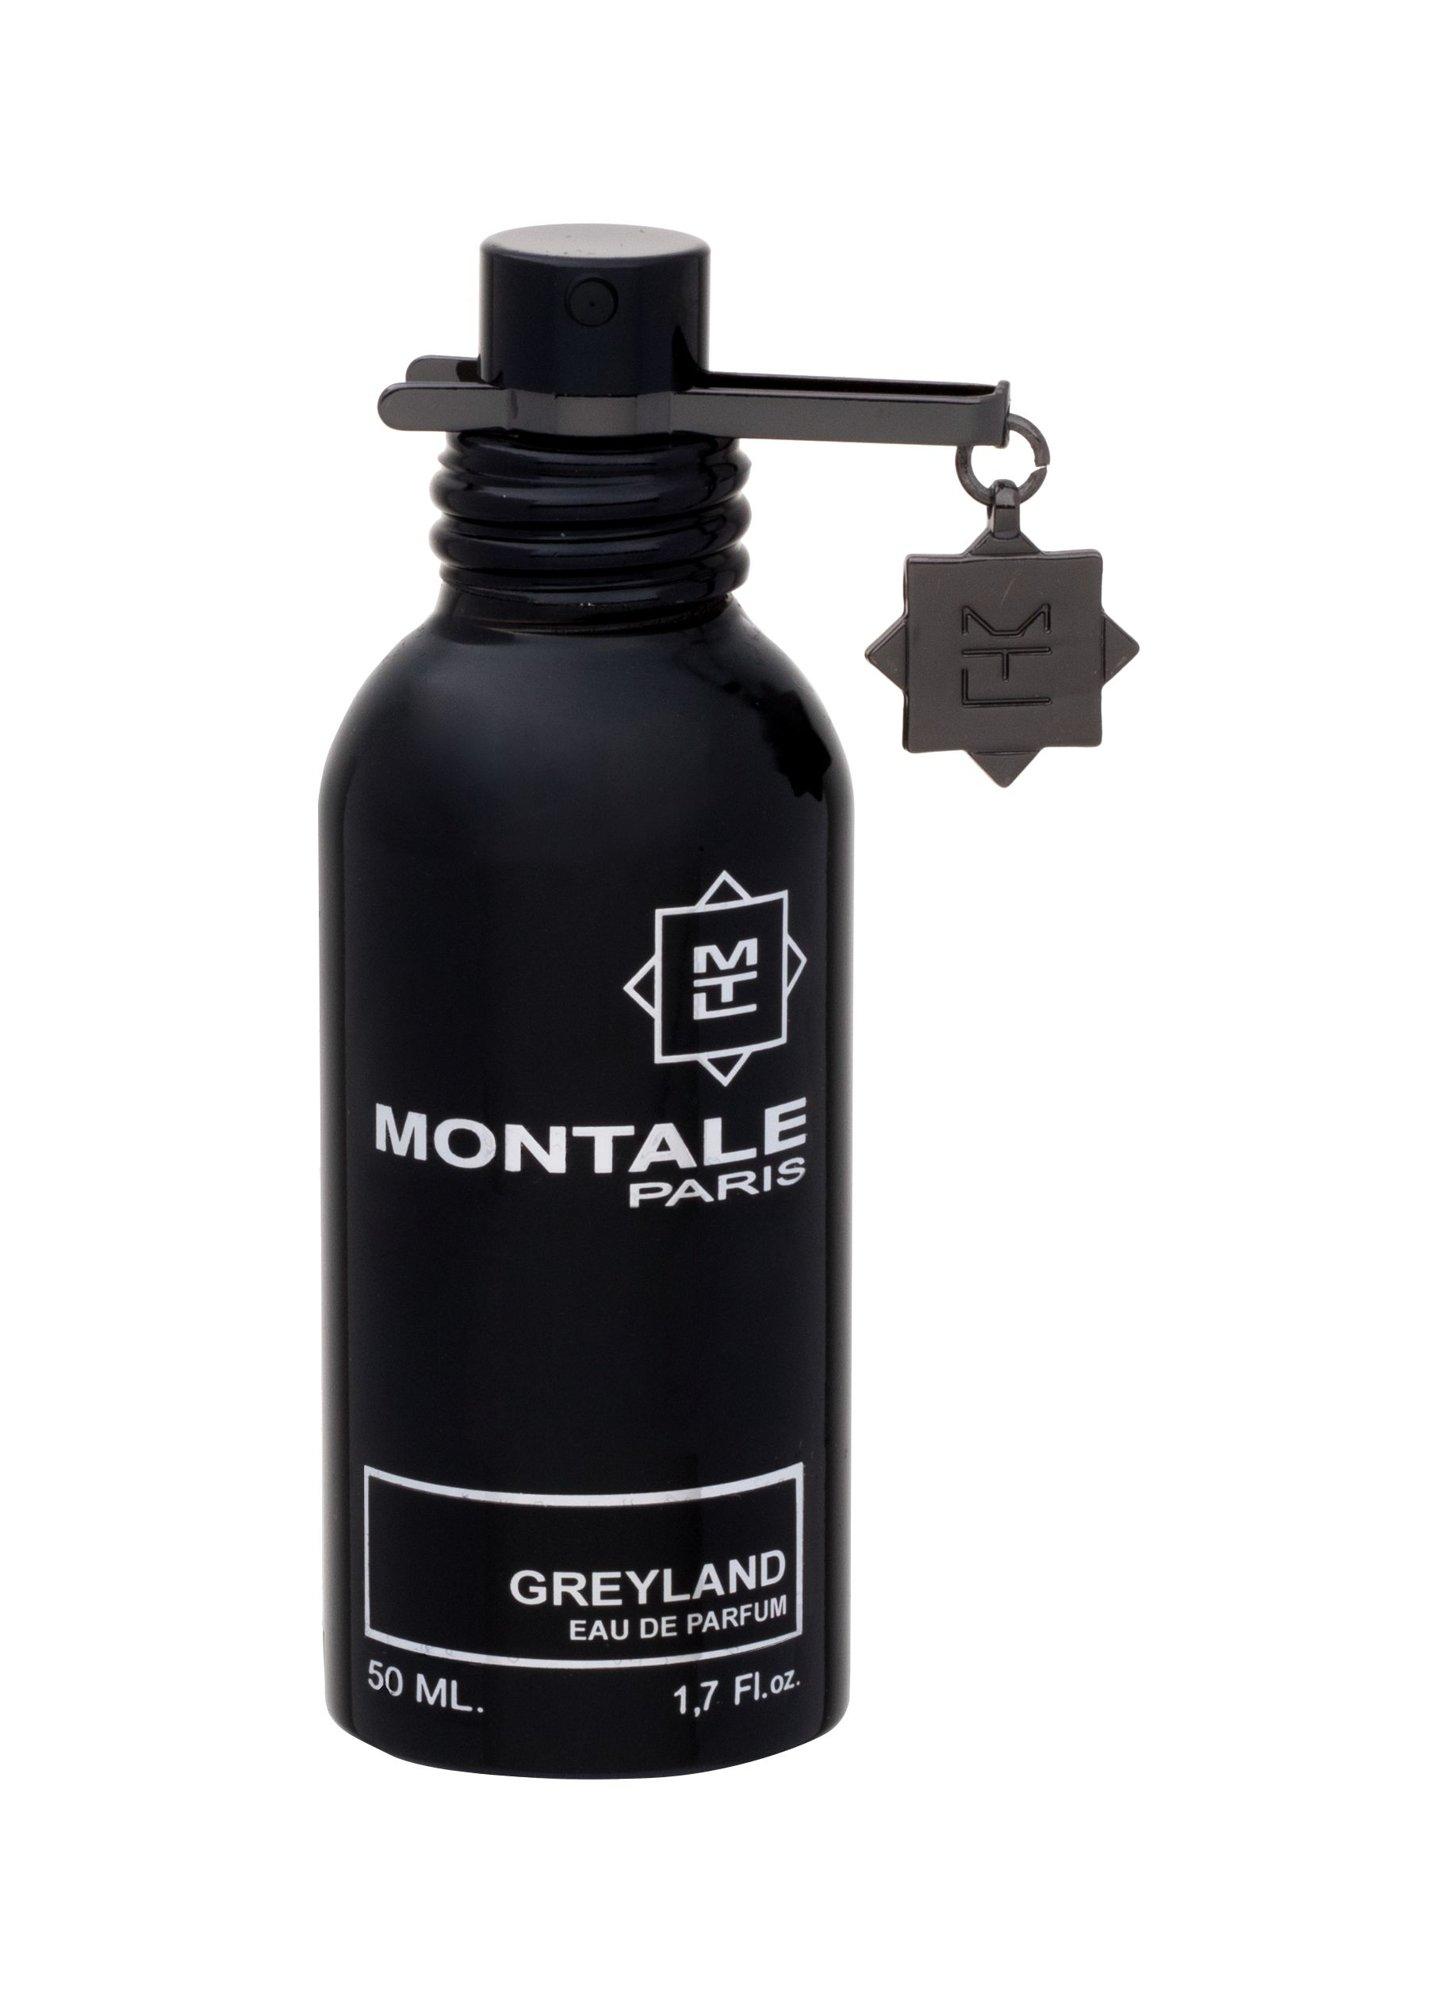 Montale Paris Greyland EDP 50ml